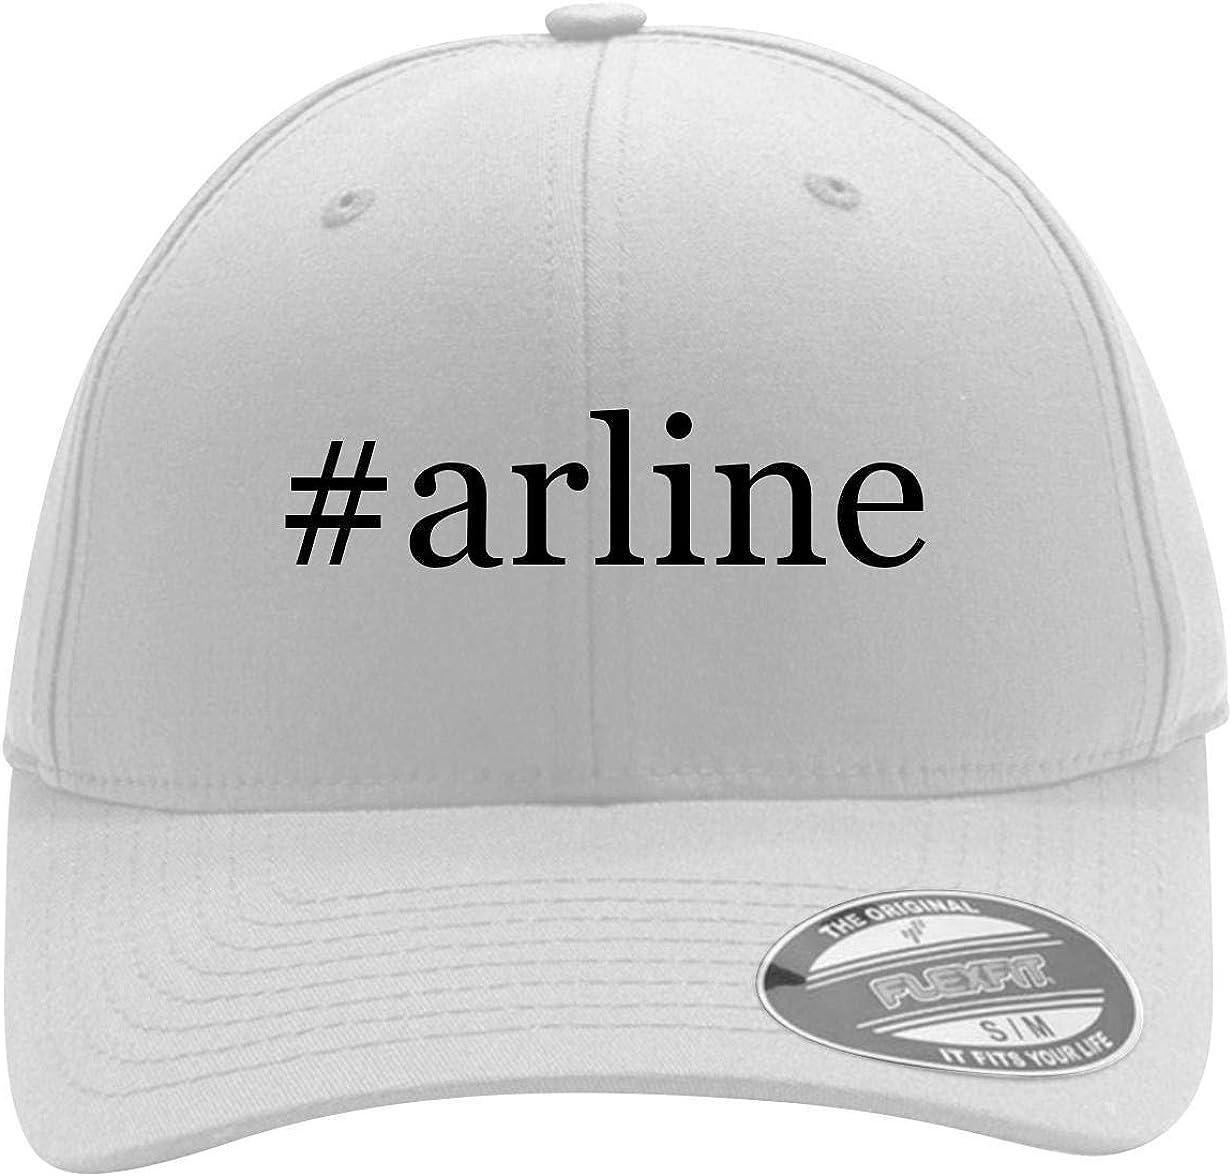 #Arline - Men's Hashtag Flexfit Baseball Cap Hat 616OMnw3K7L